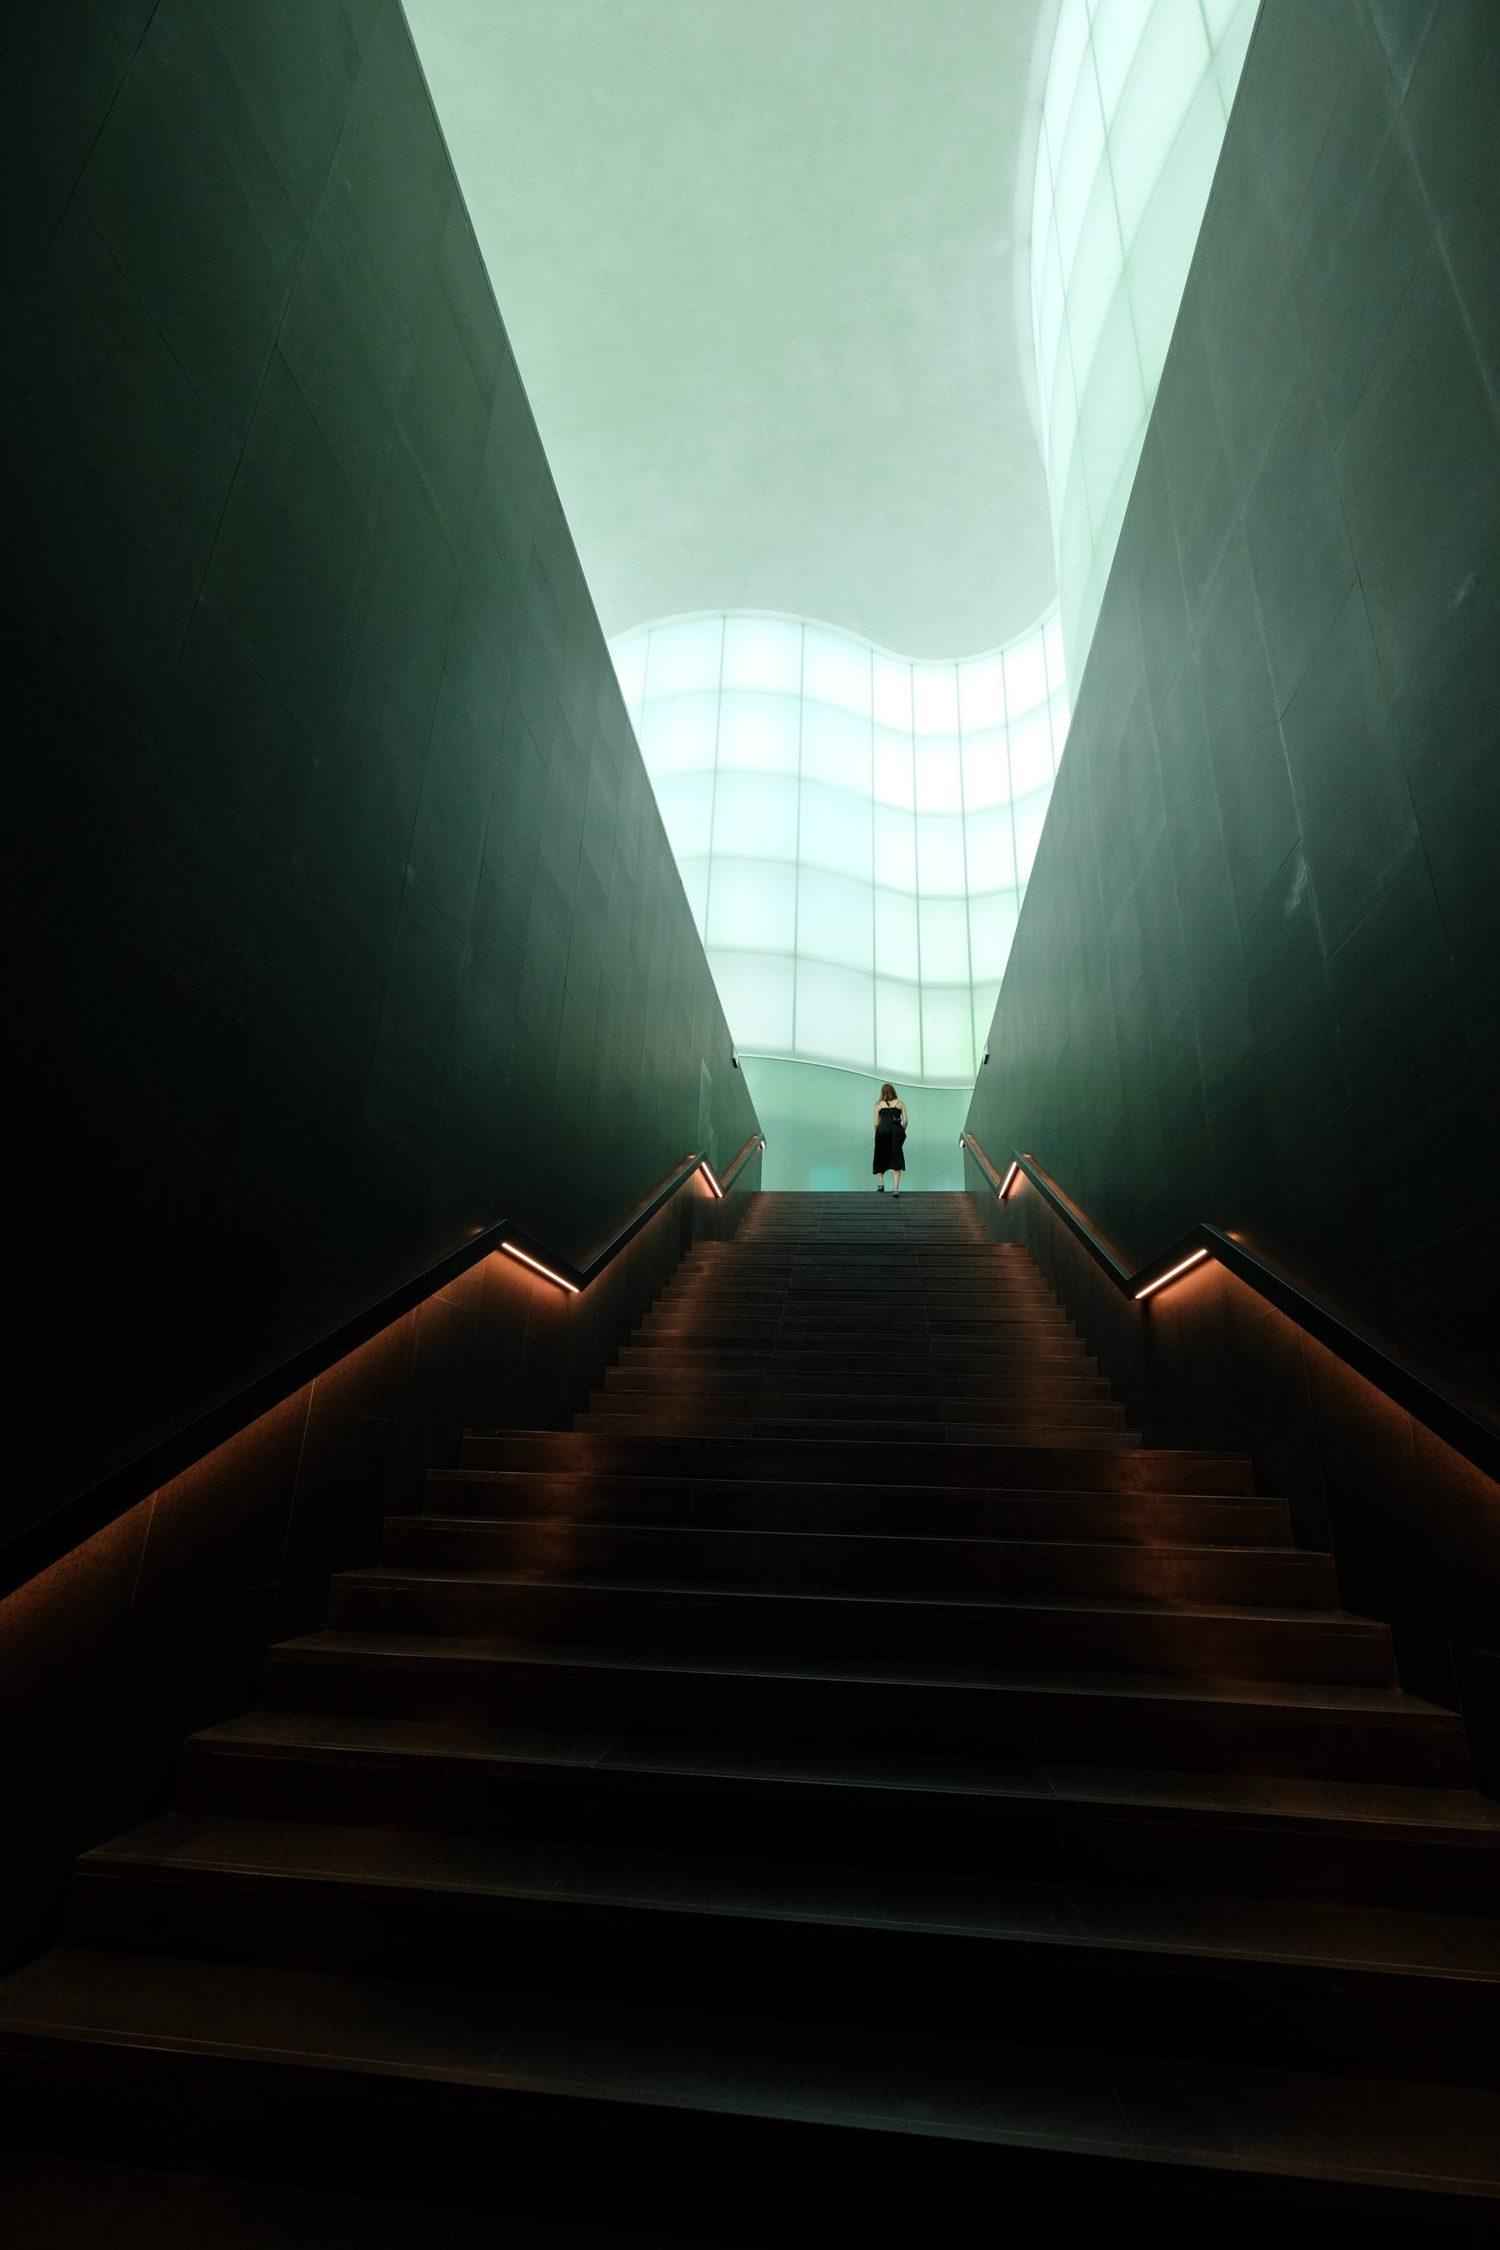 Arquitectura de museo, composición basada en líneas